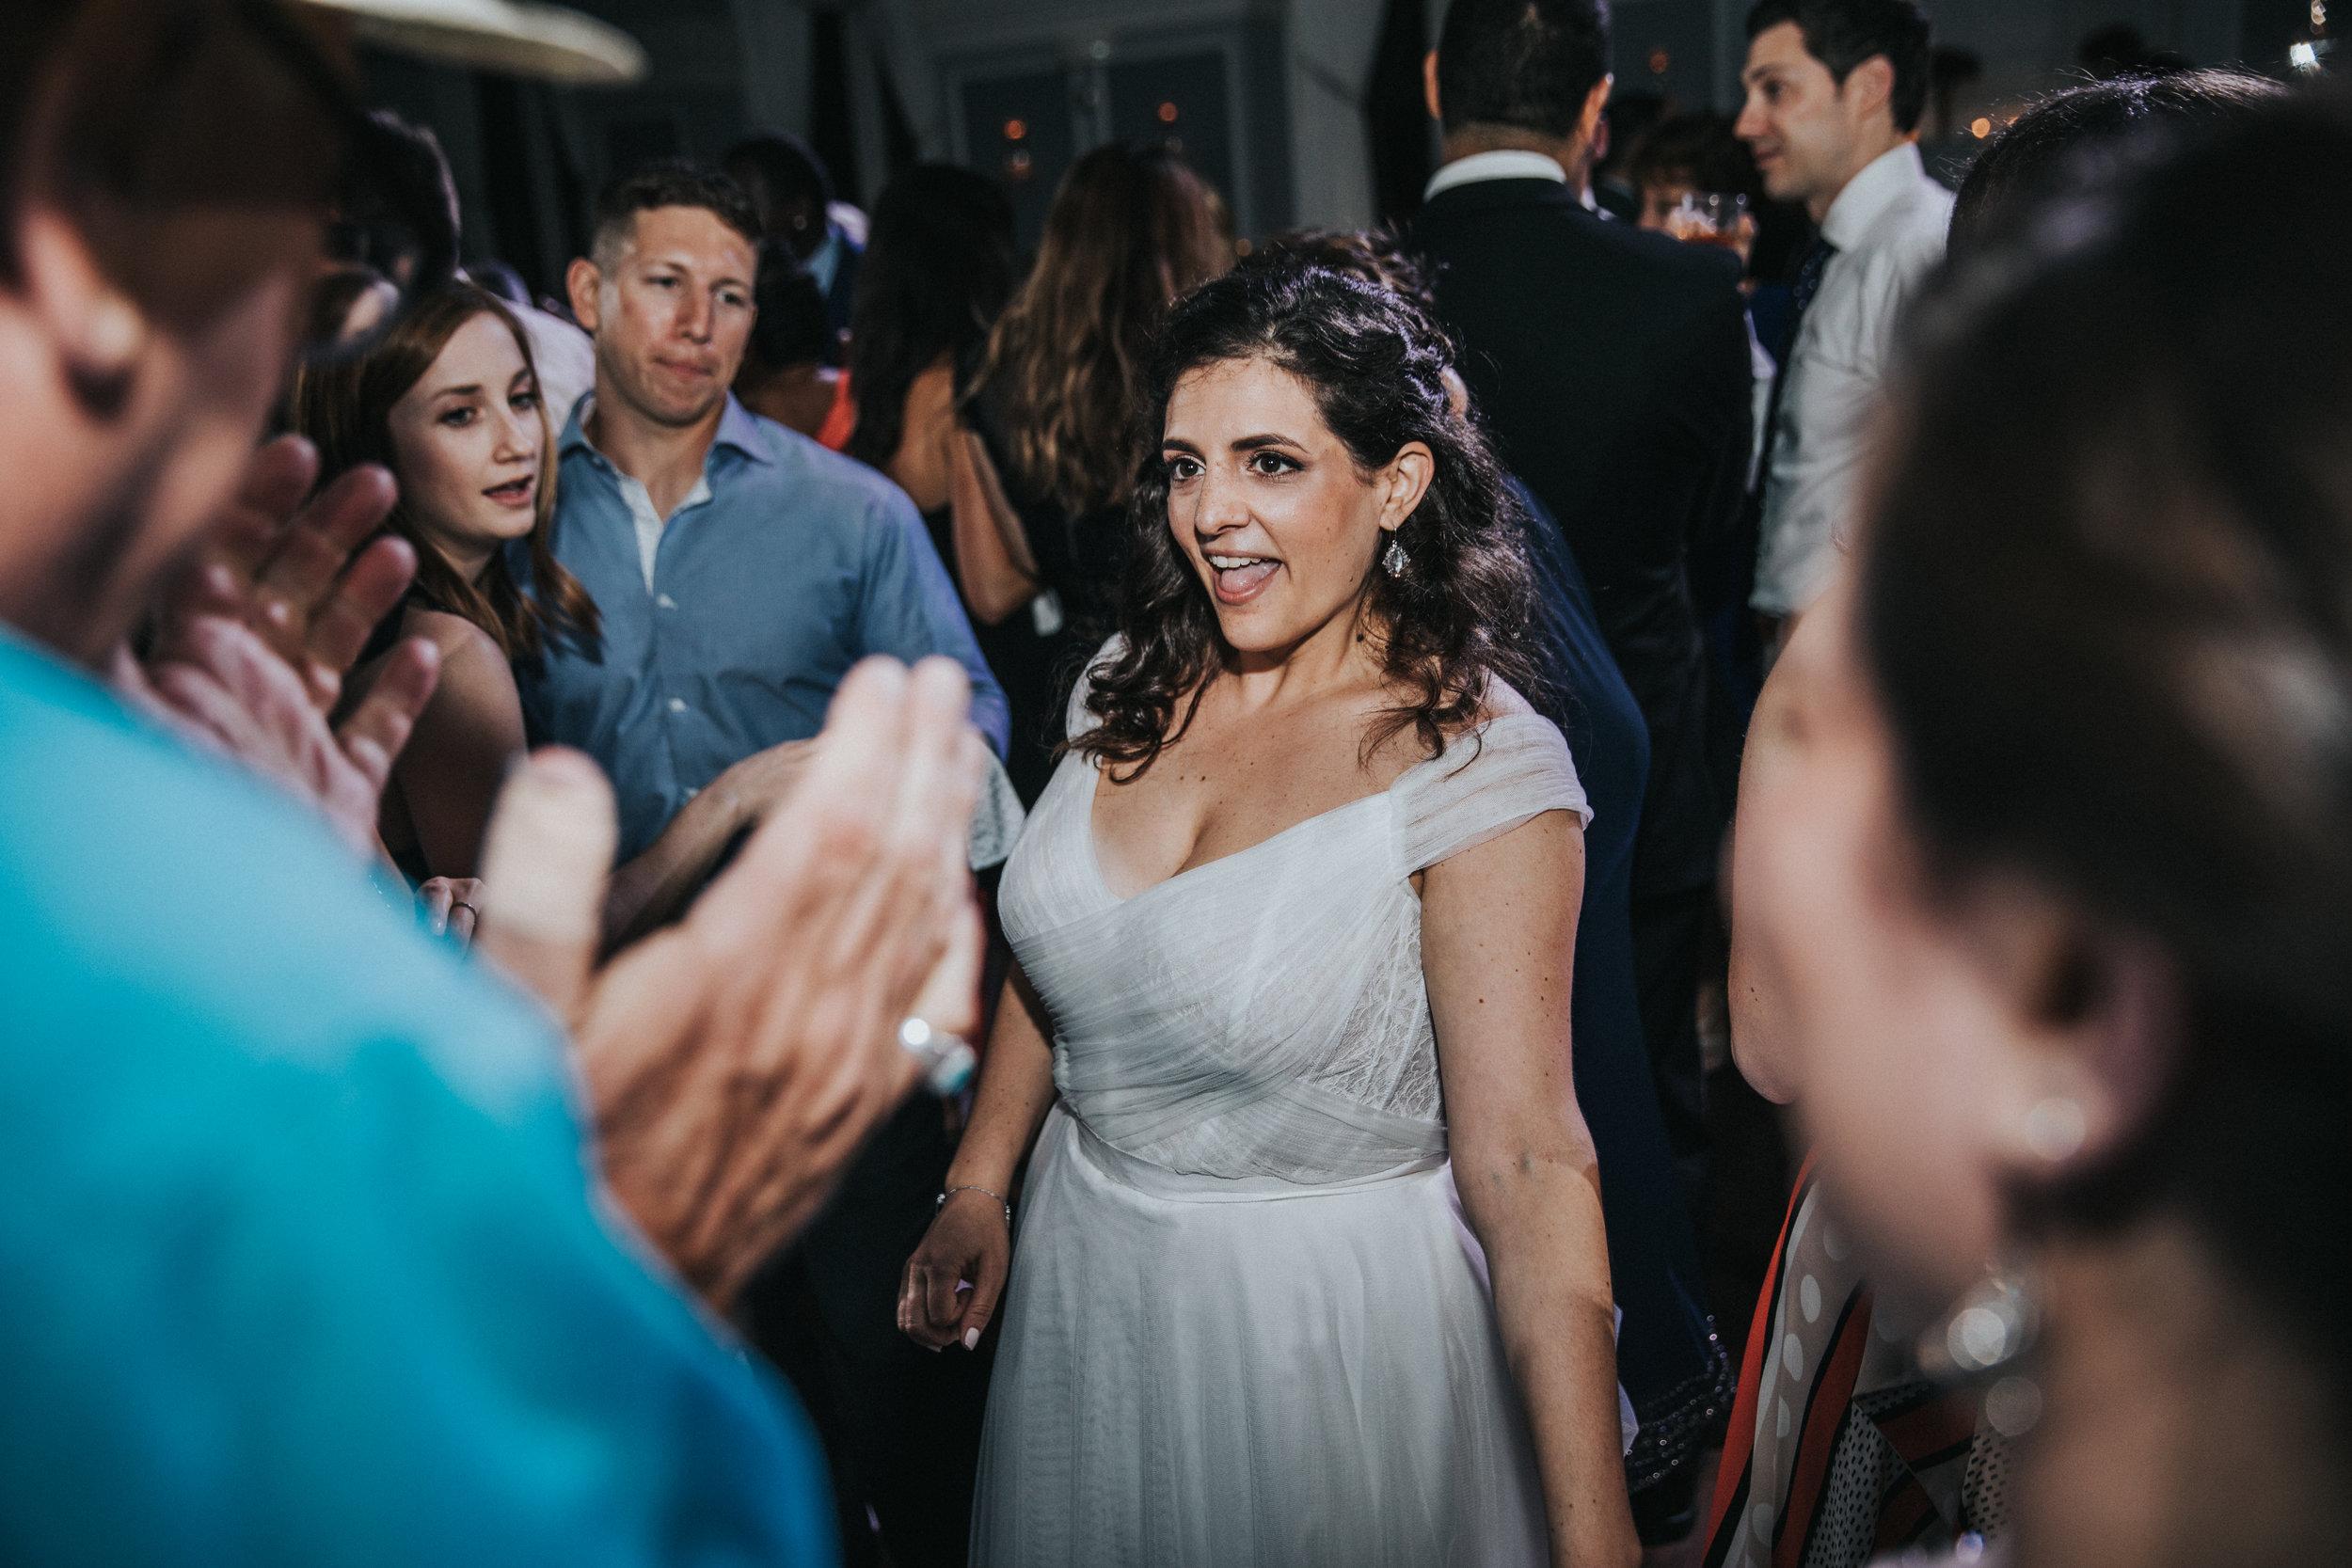 JennaLynnPhotography-NJWeddingPhotographer-Philadelphia-Wedding-ArtsBallroom-Reception-129.jpg